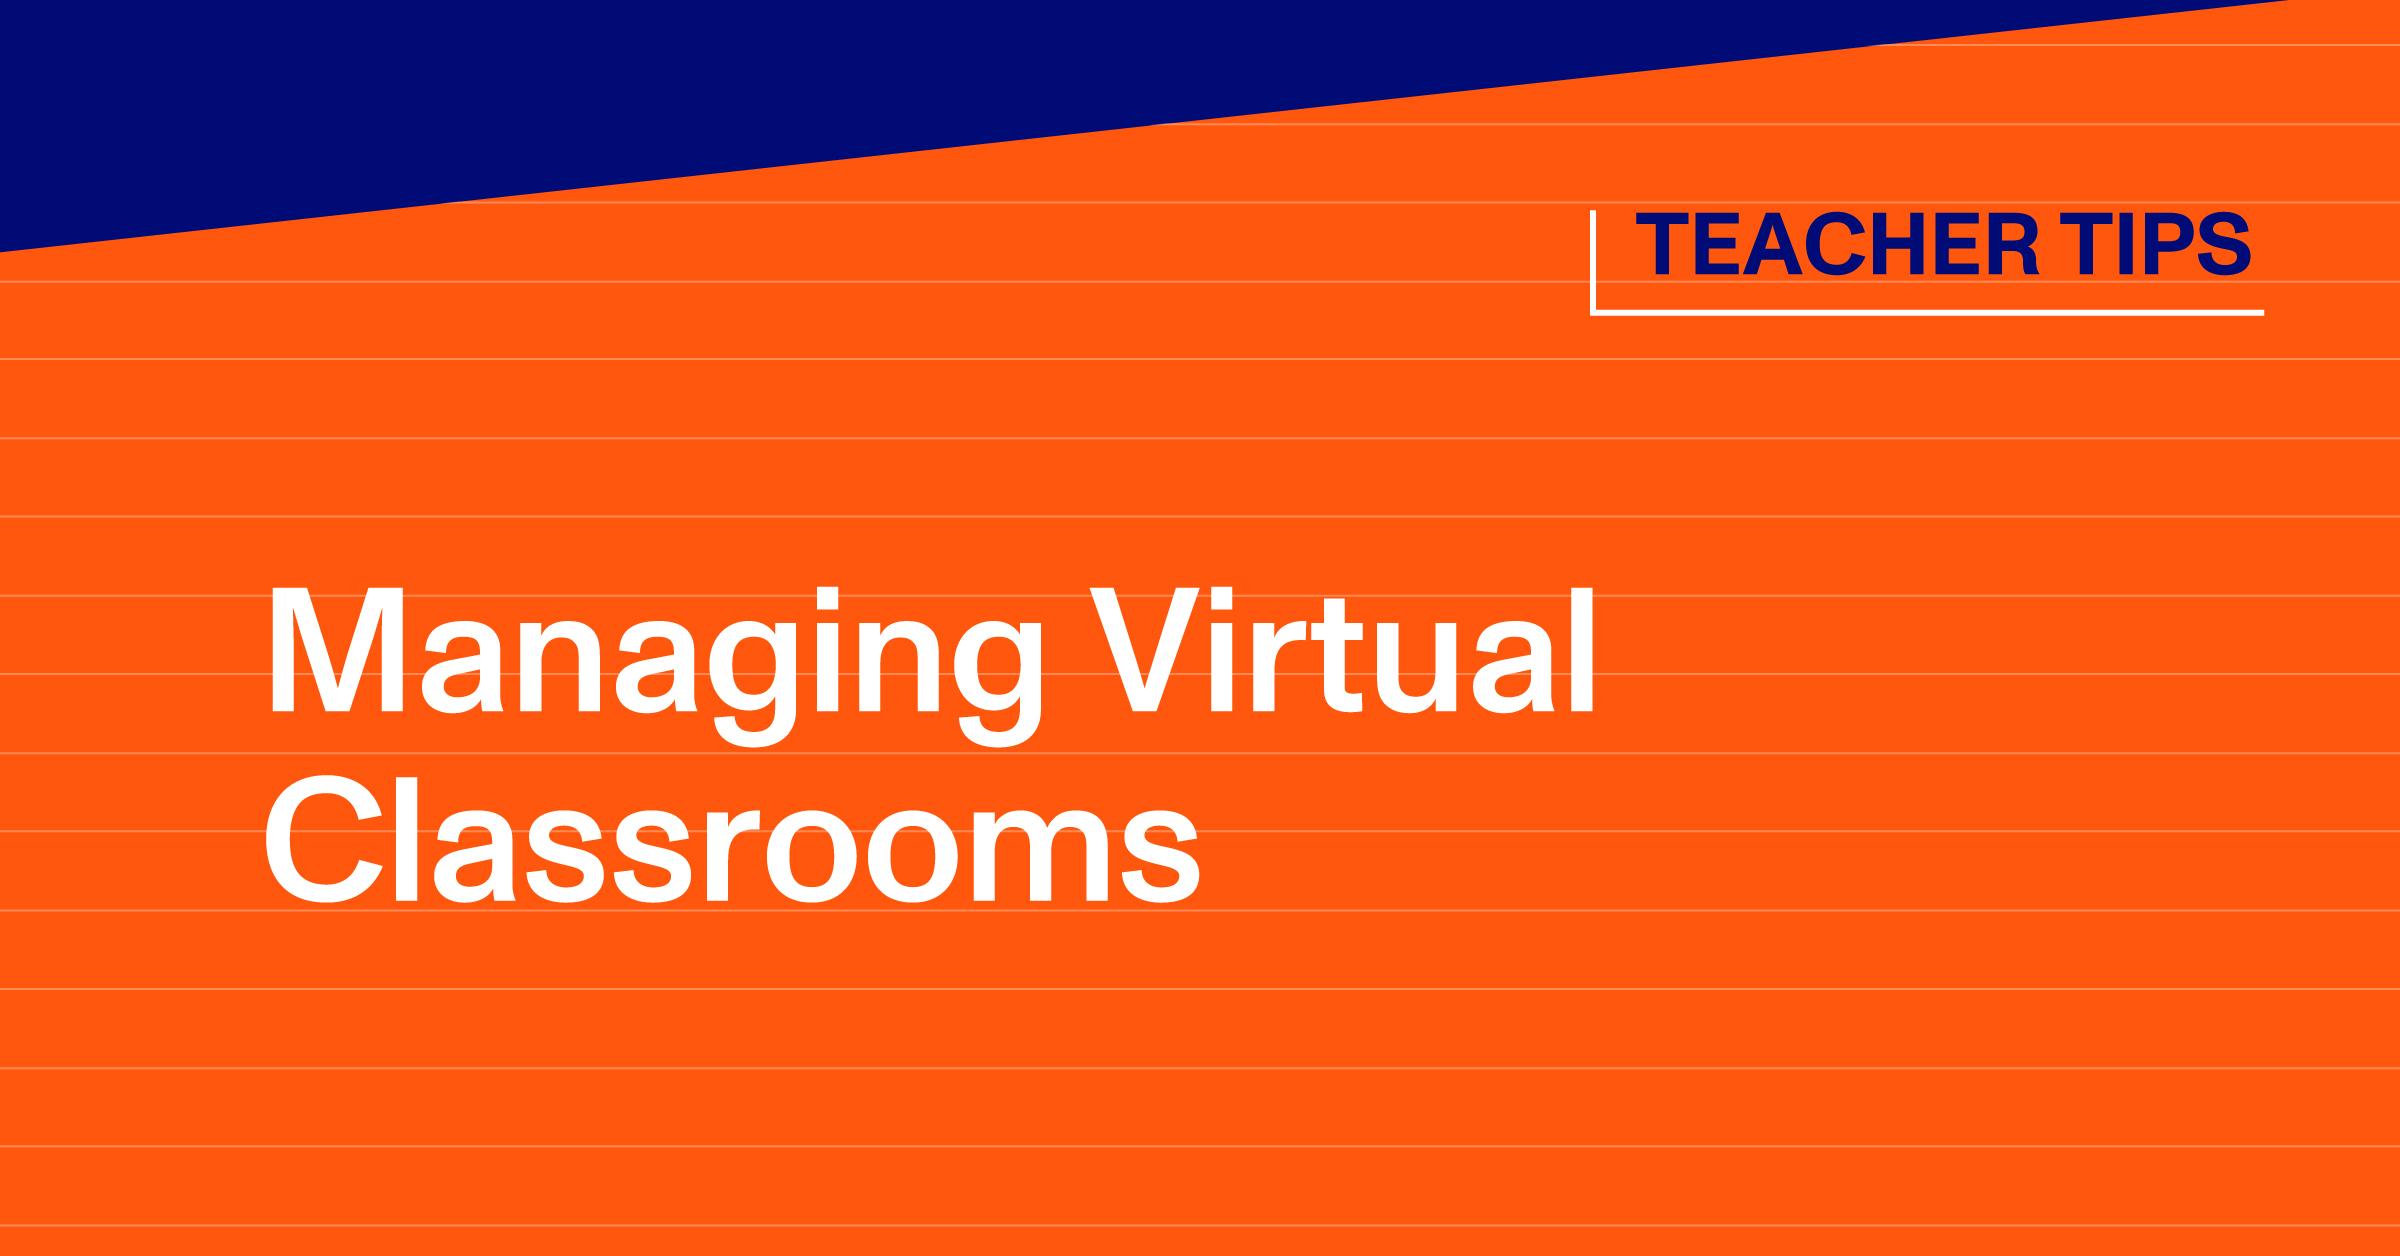 Managing Virtual Classrooms